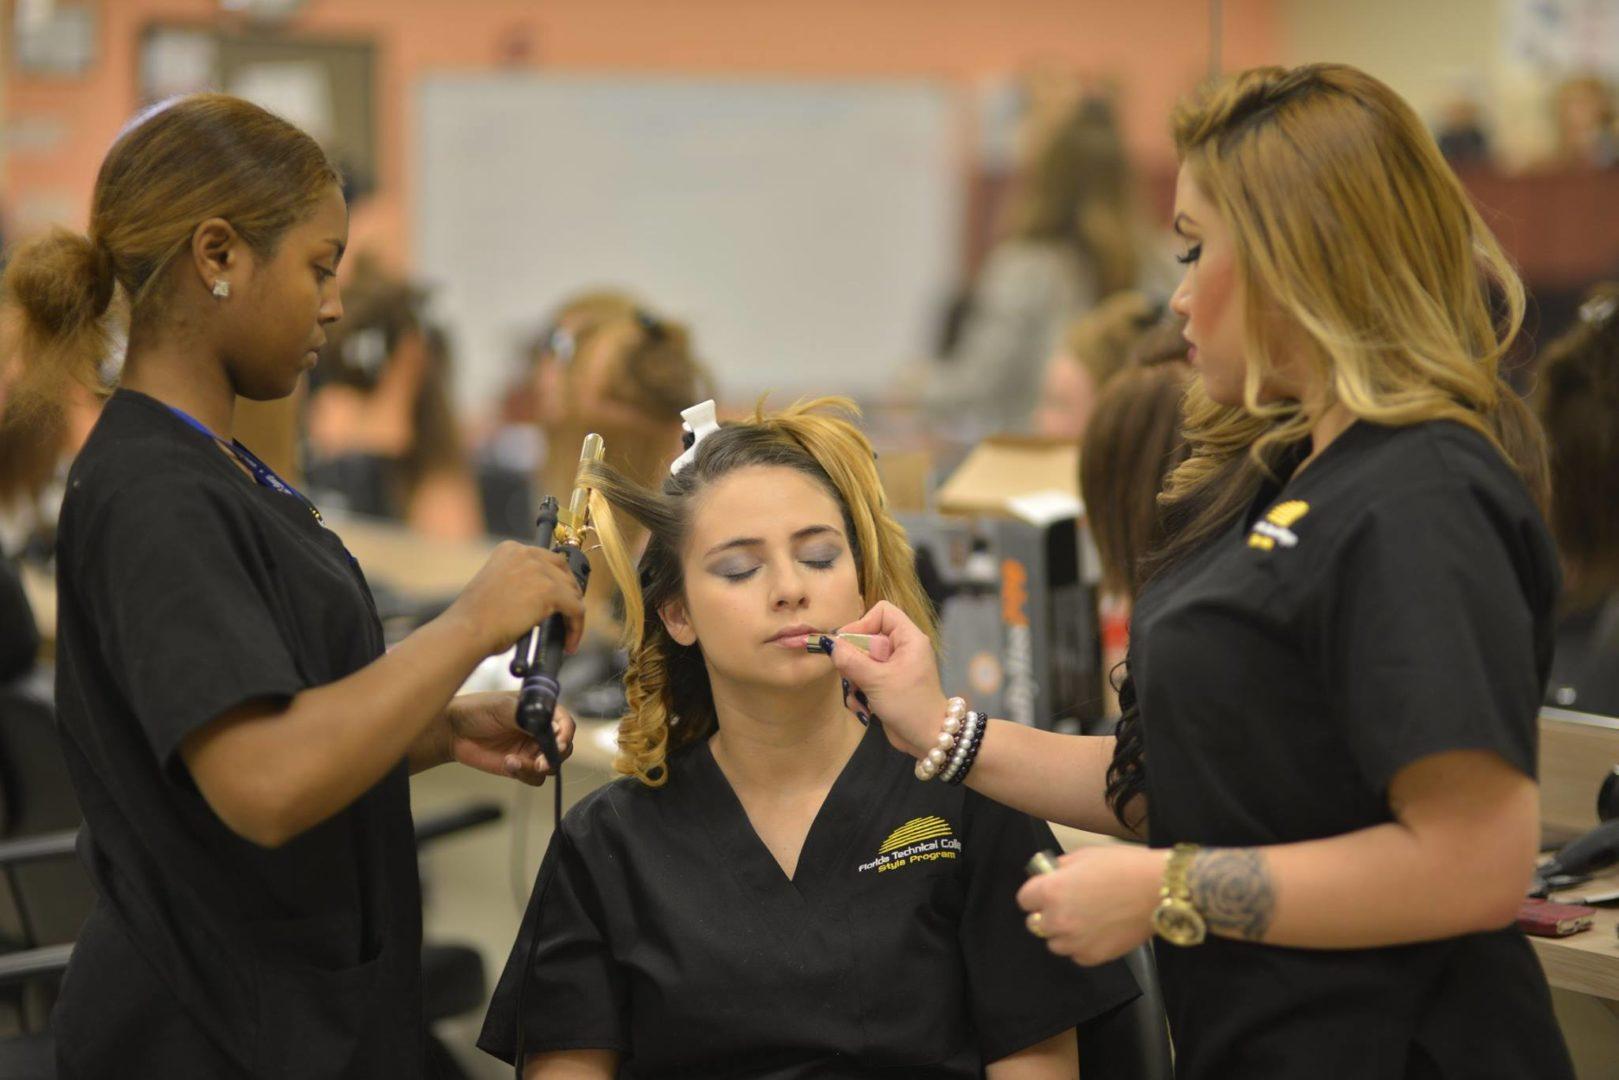 FTC pembroke pines- beauty diploma program